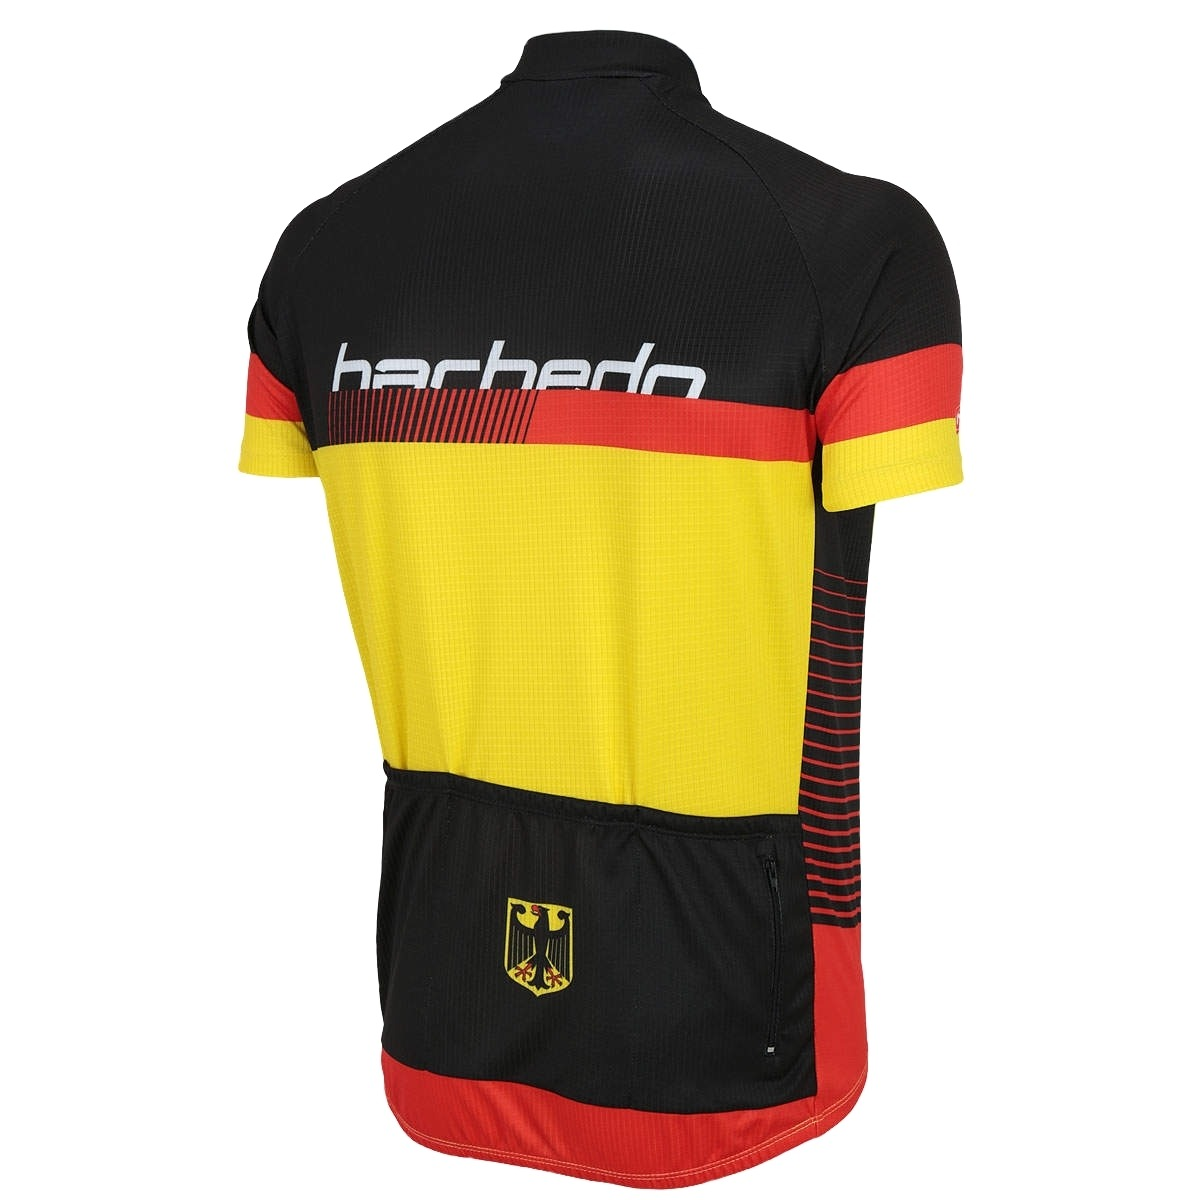 9dbb58b896aa6 Camisa Ciclismo Barbedo Classic Alemanha - M - R  145